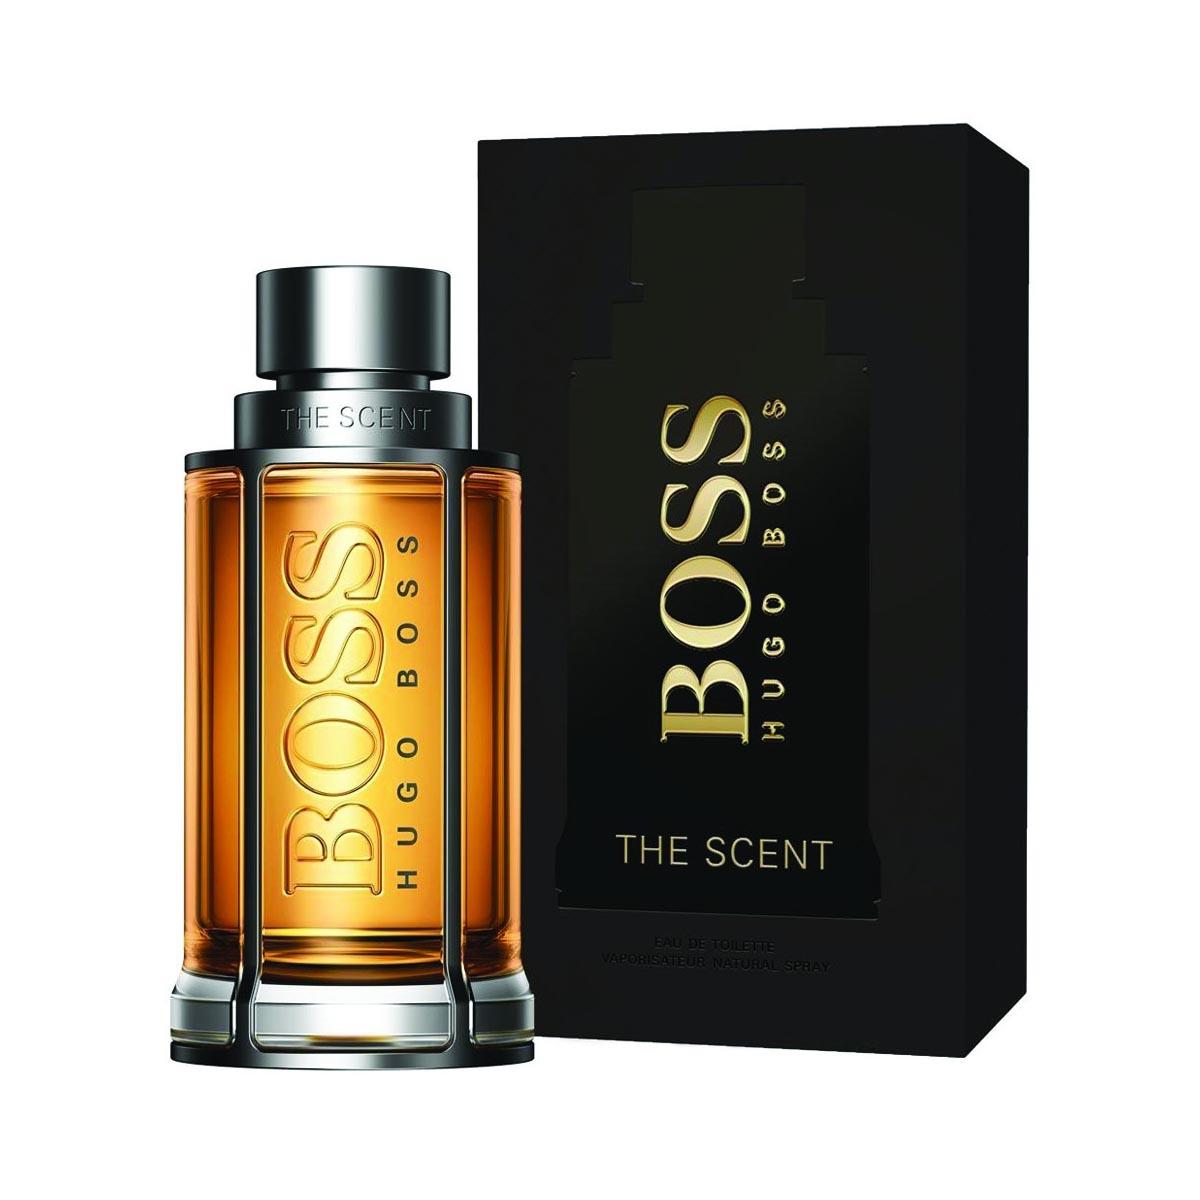 Hugo boss scent eau de toilette 50ml vaporizador